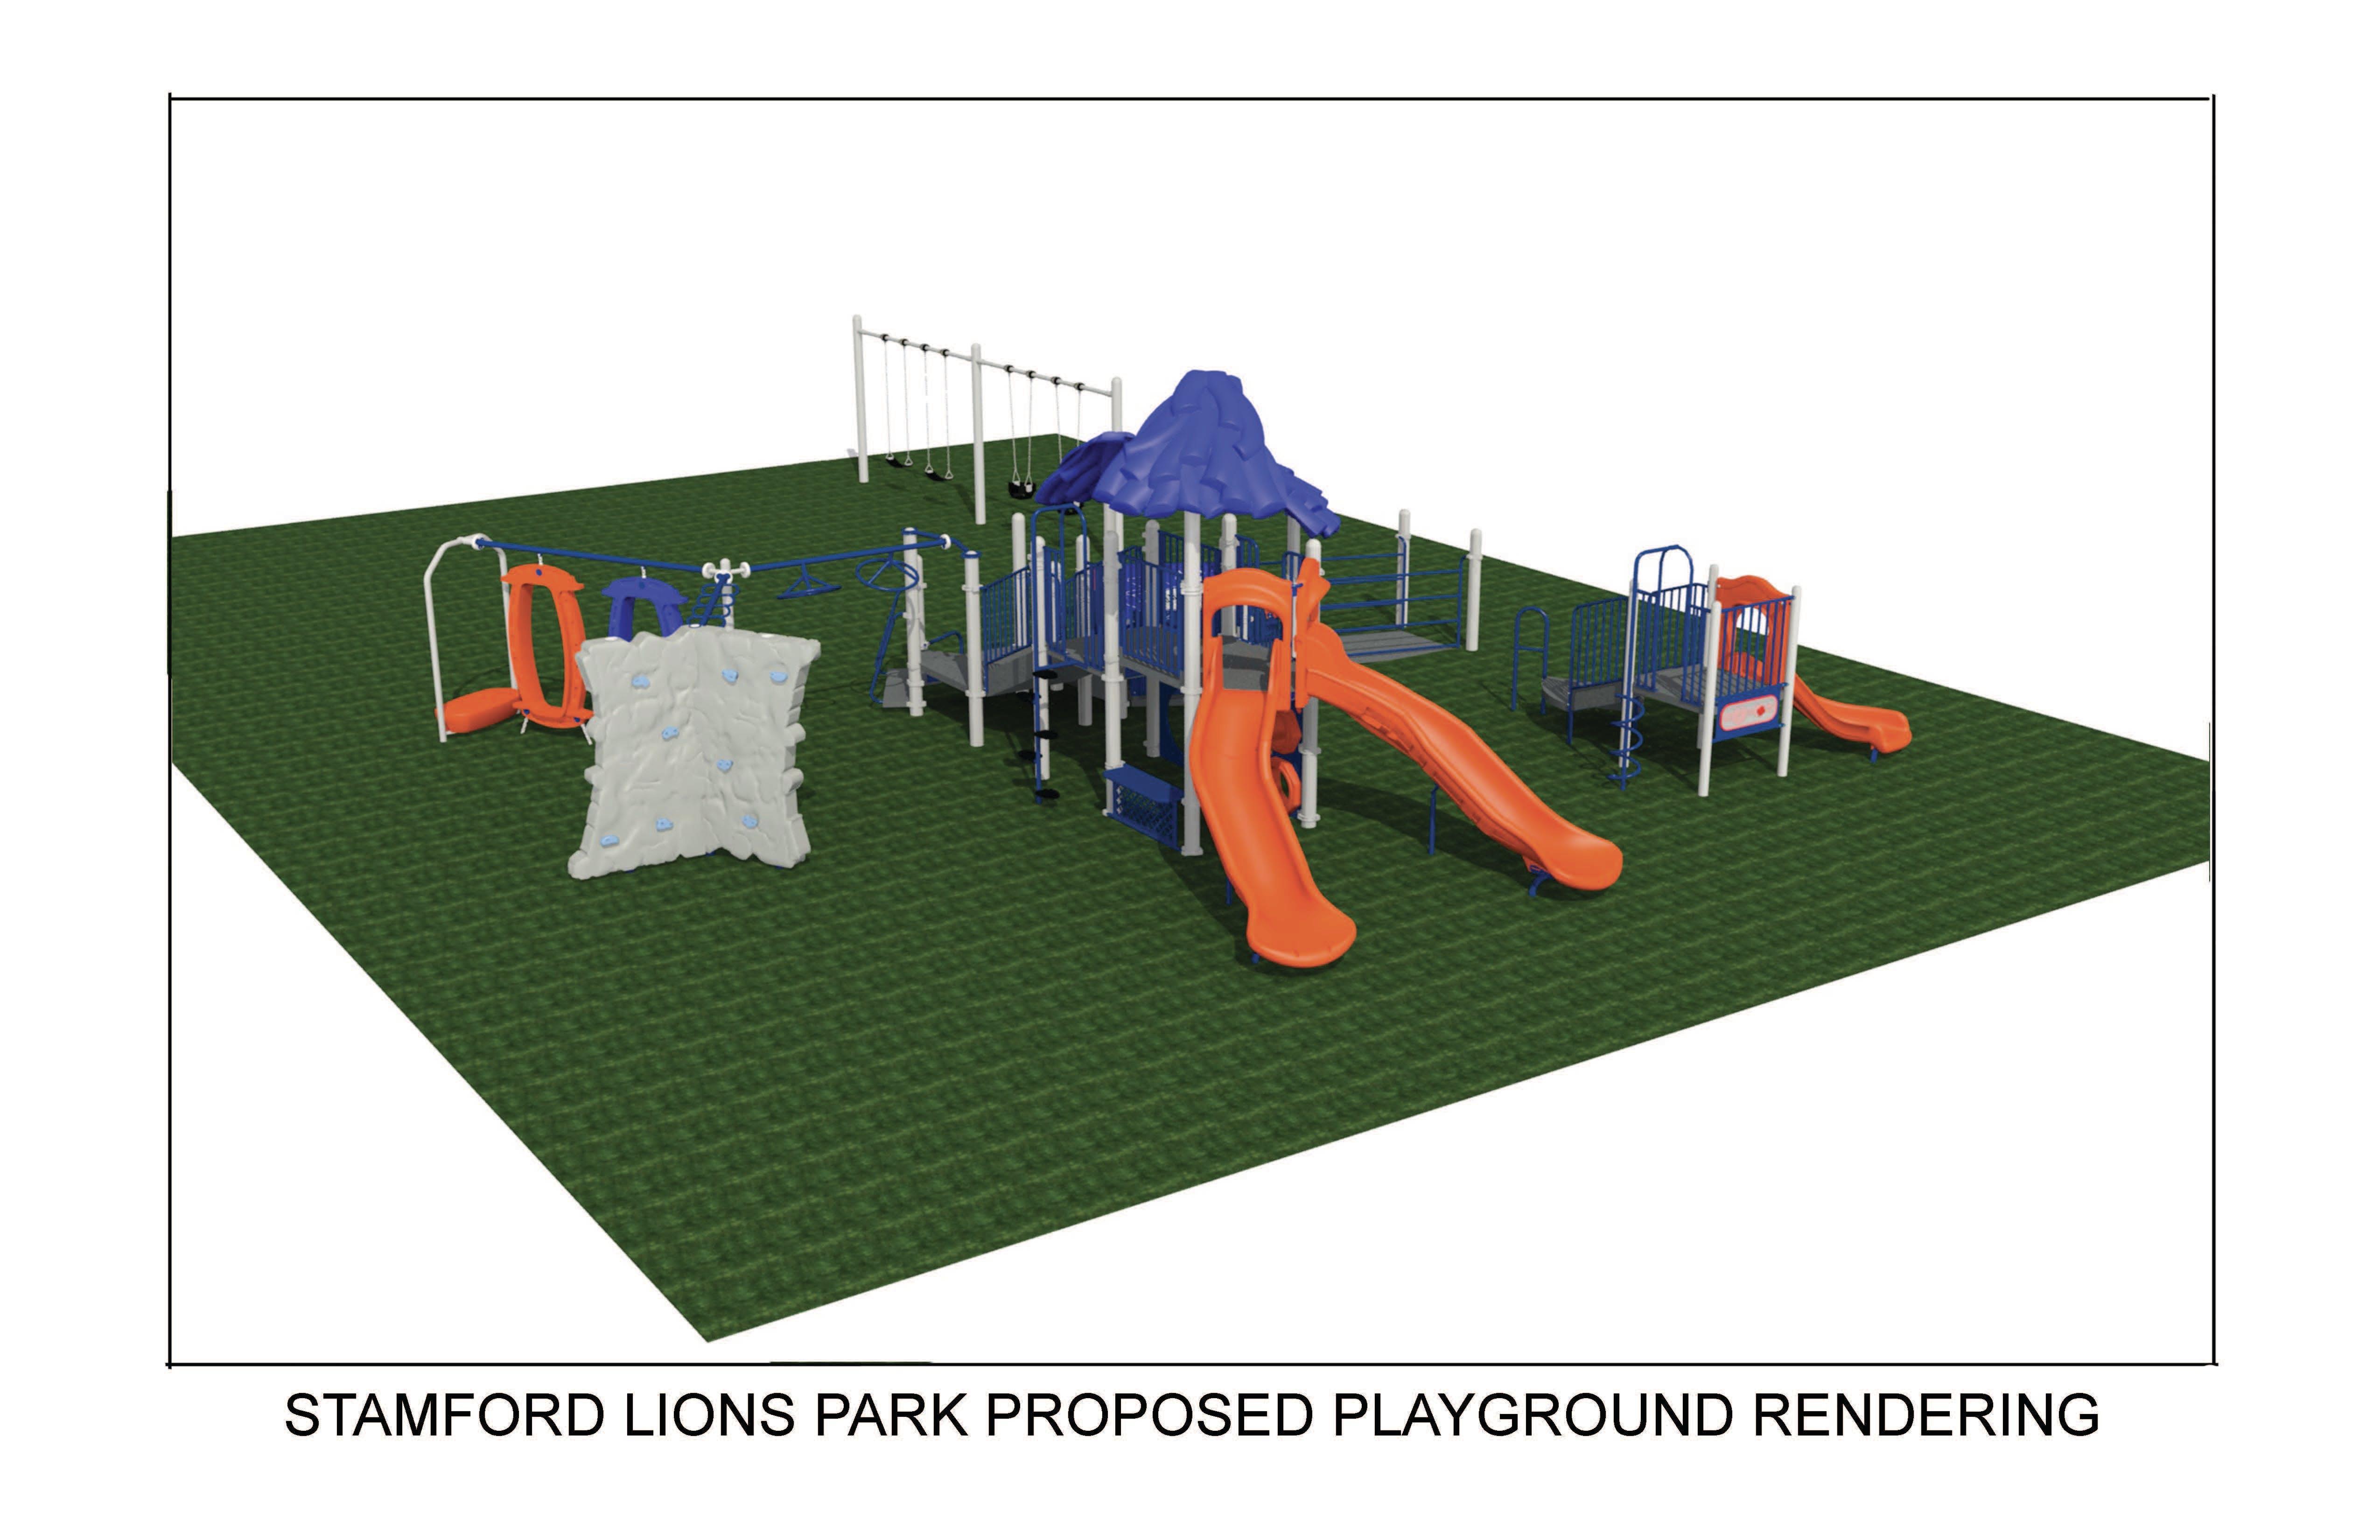 Stamford Lions Rendering